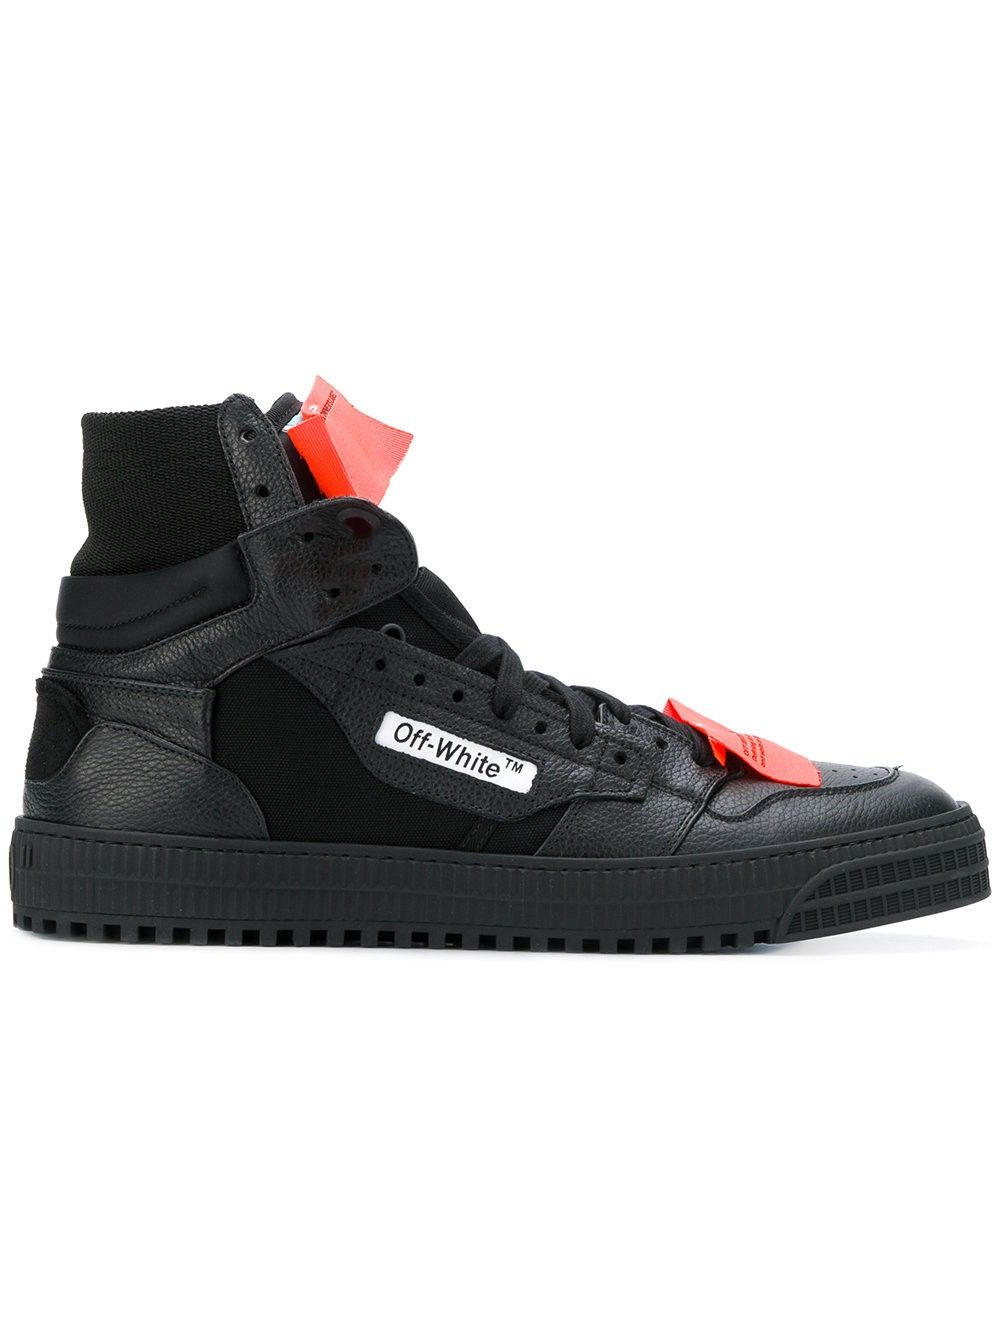 bd846449130b Off-White Black Low 3.0 Sneakers - 40